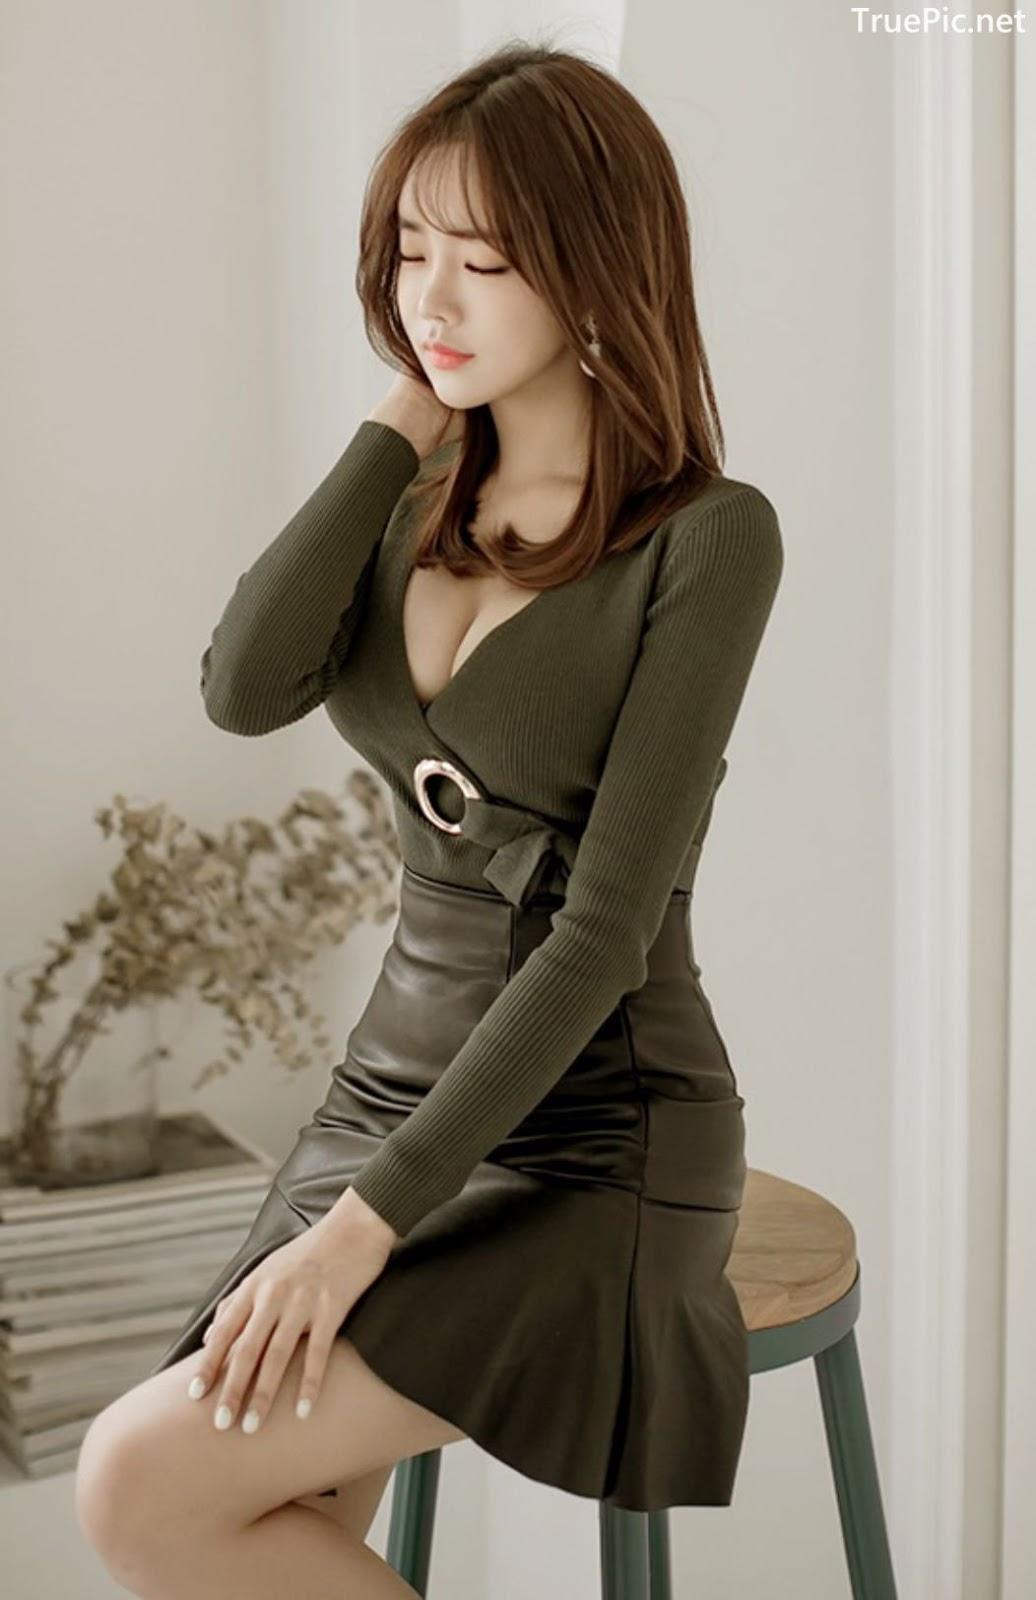 Image-Korean-Fashion-Model–Kang-Eun-Wook–Indoor-Photoshoot-Collection-2-TruePic.net- Picture-1